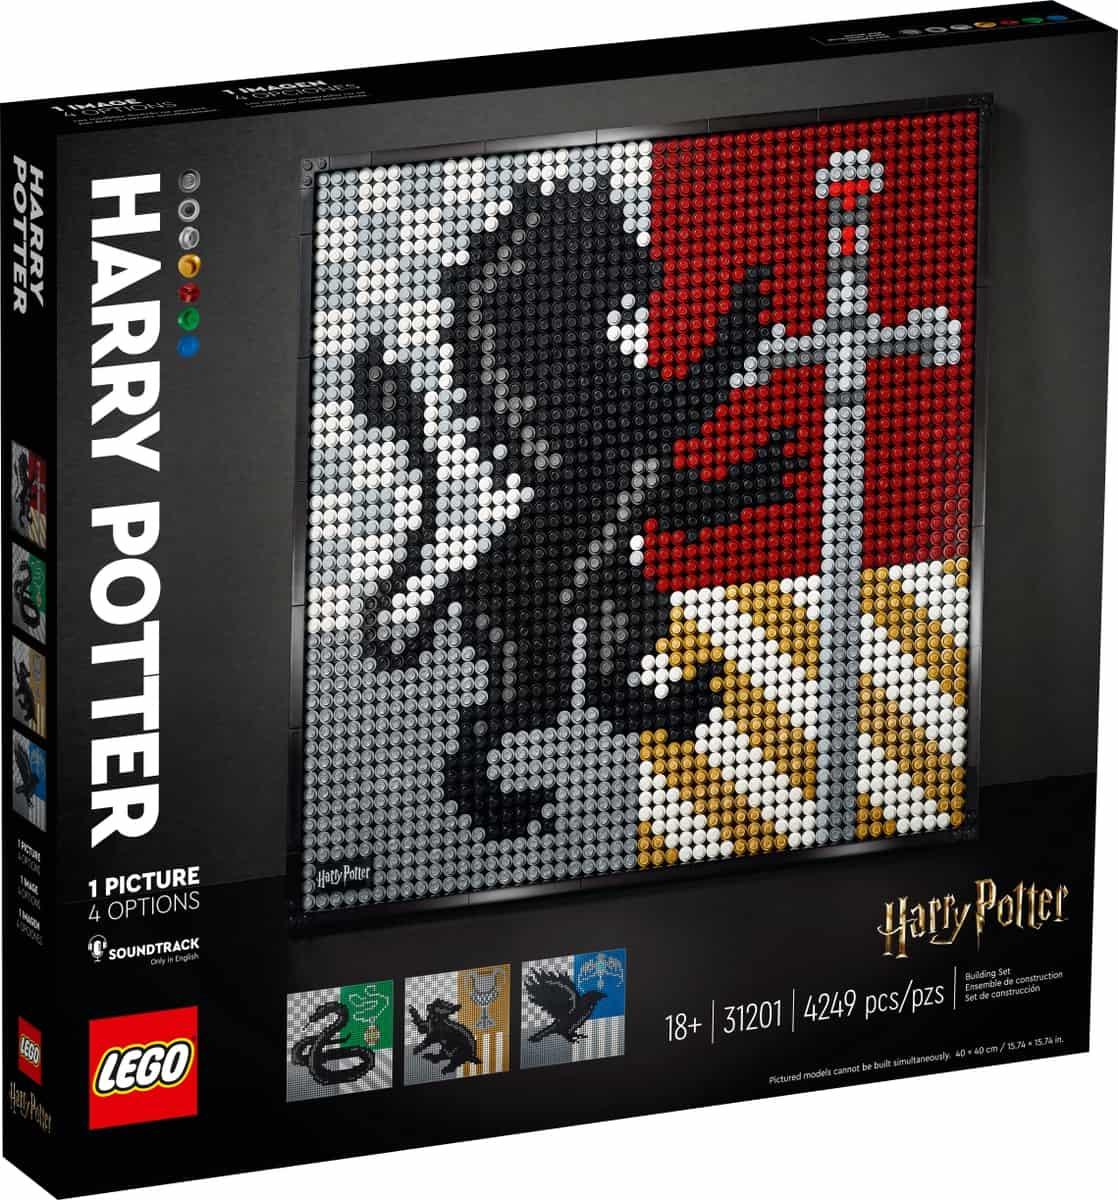 lego 31201 harry potter hogwartsskoldar